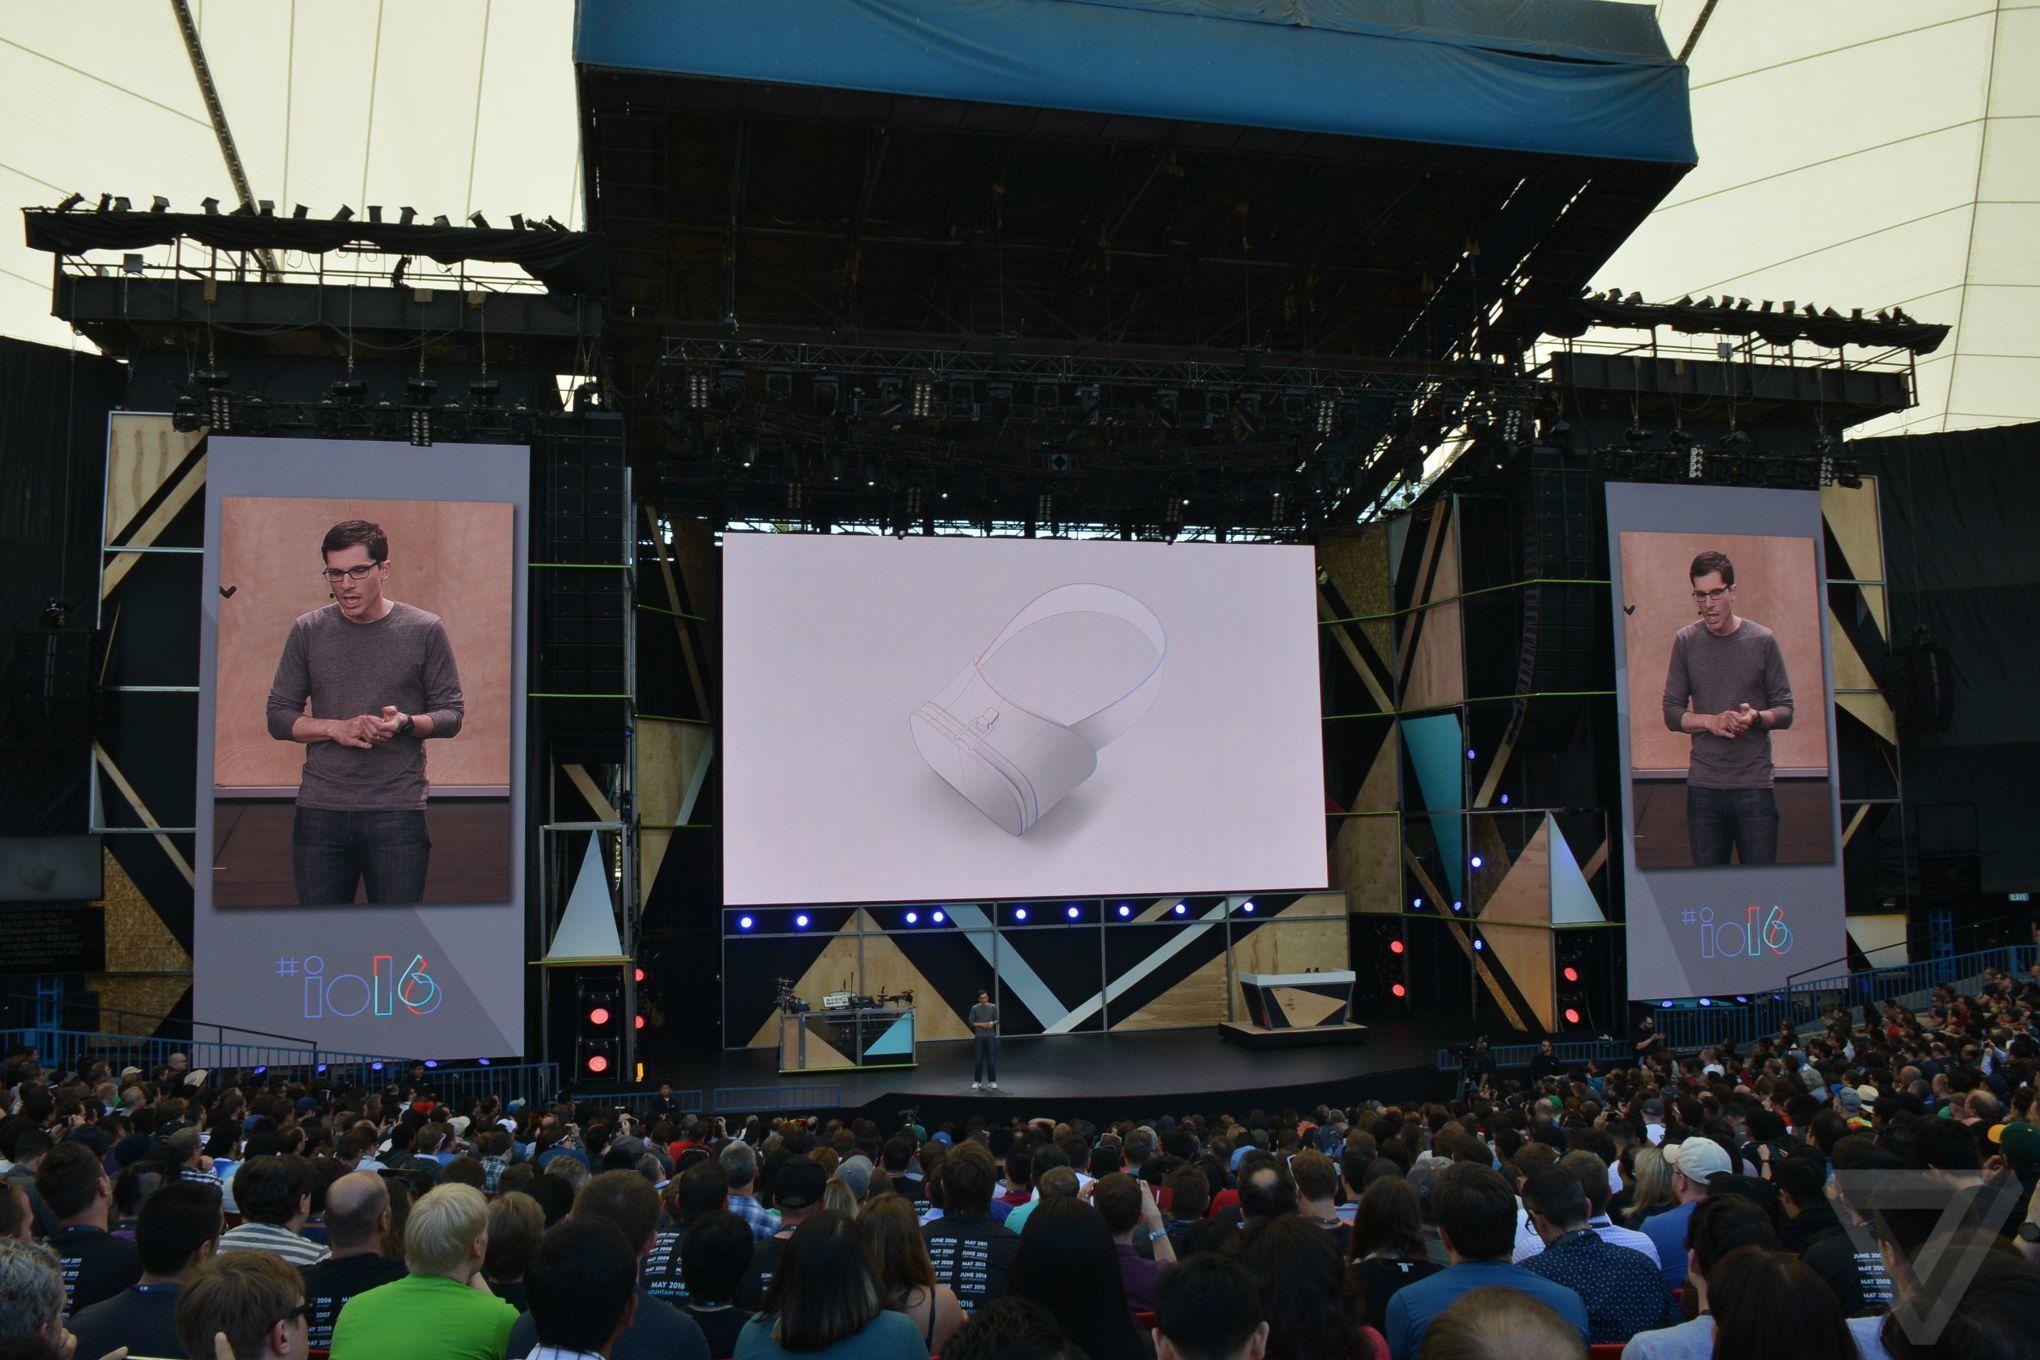 Daydream at Google I/O 2016 announcement photos